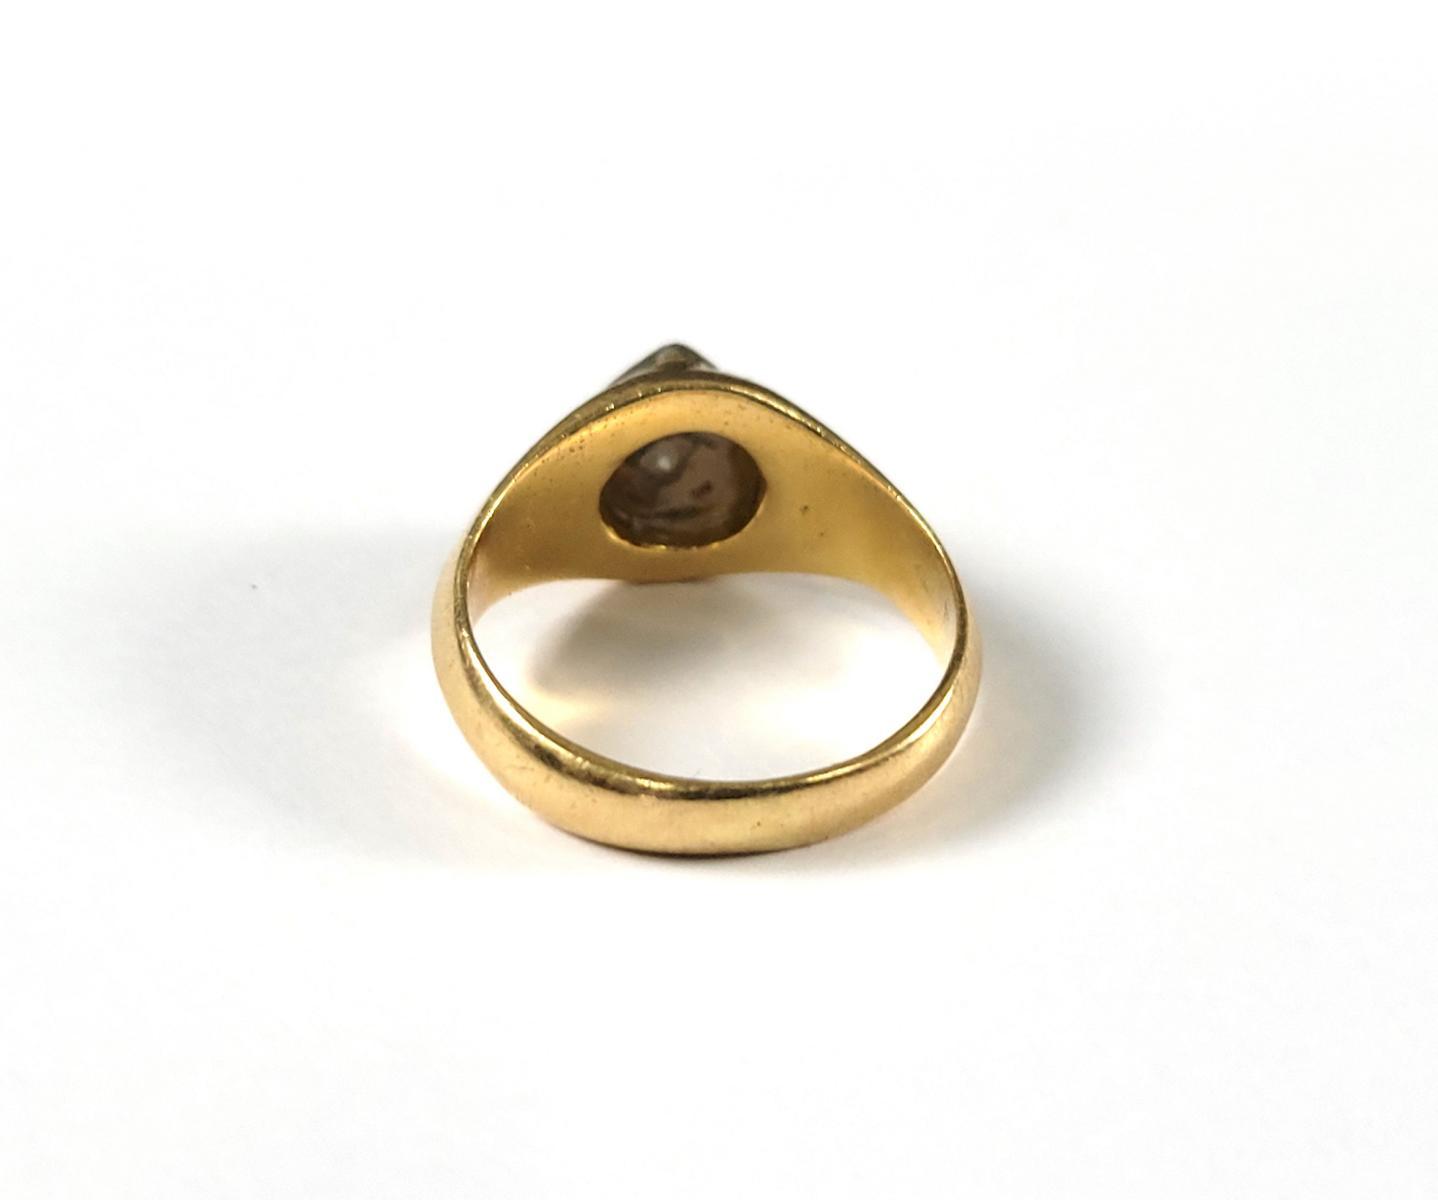 Damenring mit Diamanten, 18 Karat Gelbgold-3